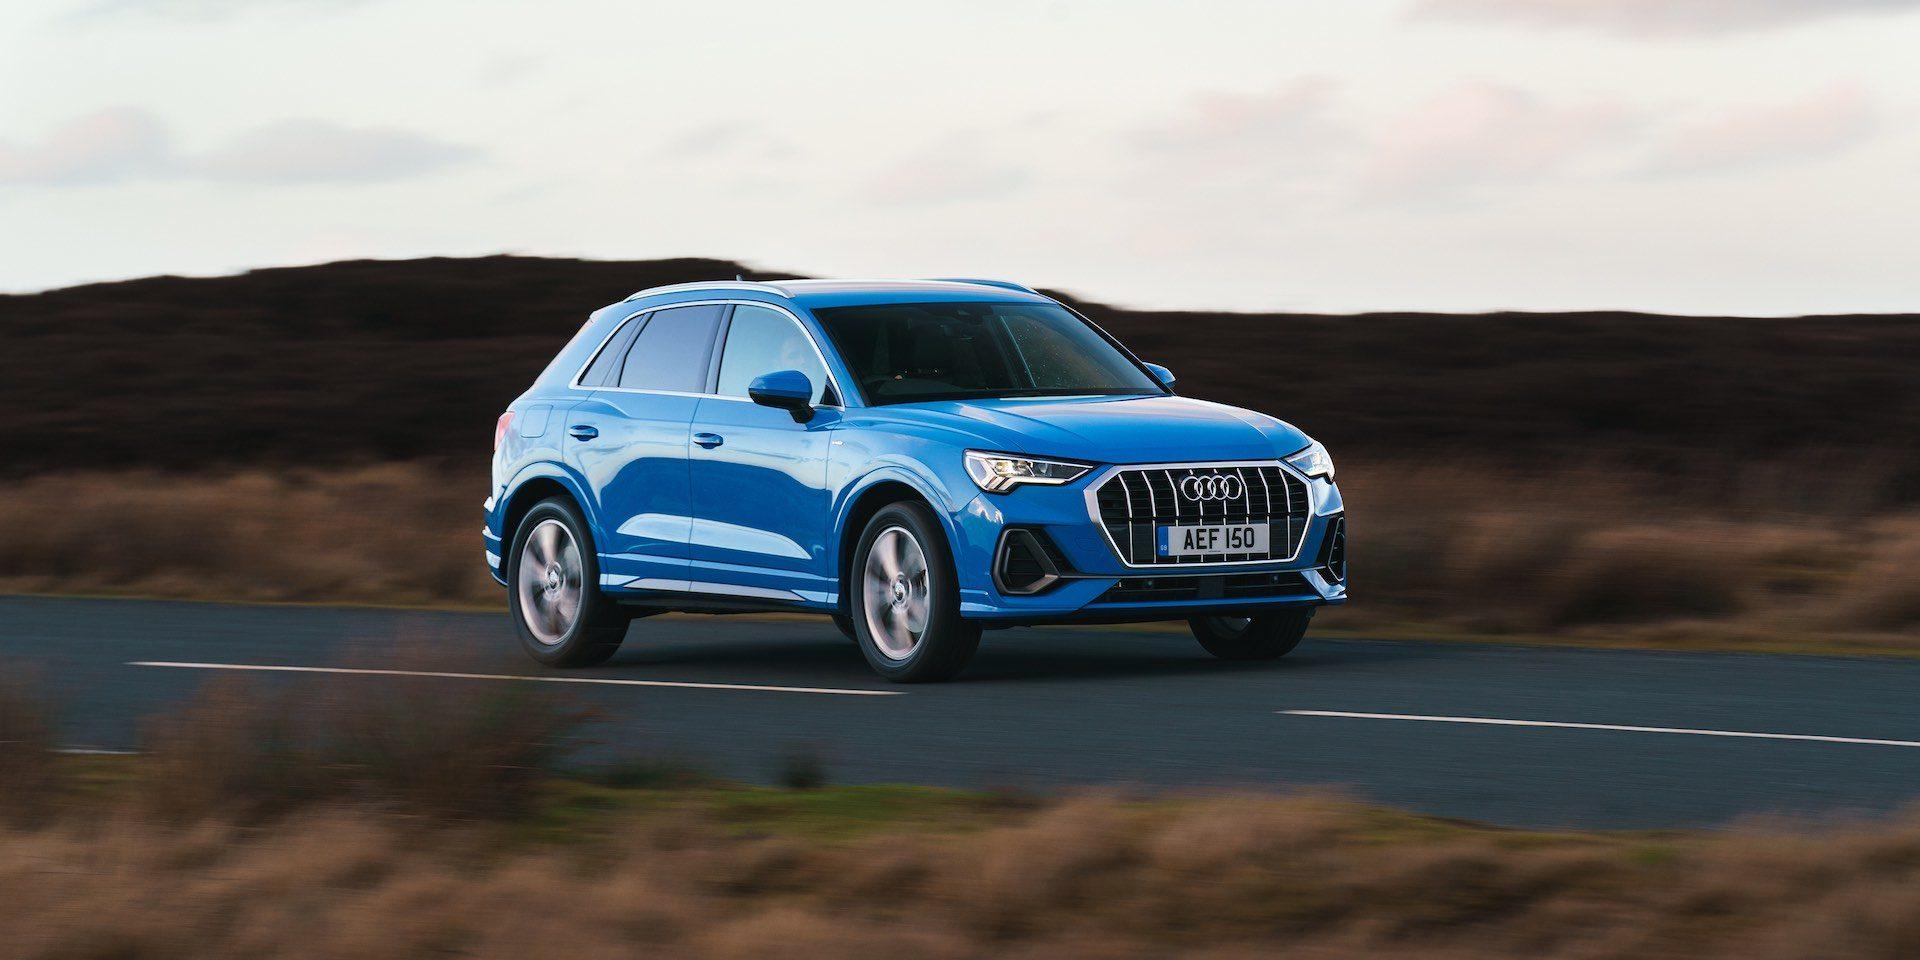 2019 Audi Q3 review wallpaper | The Car Expert